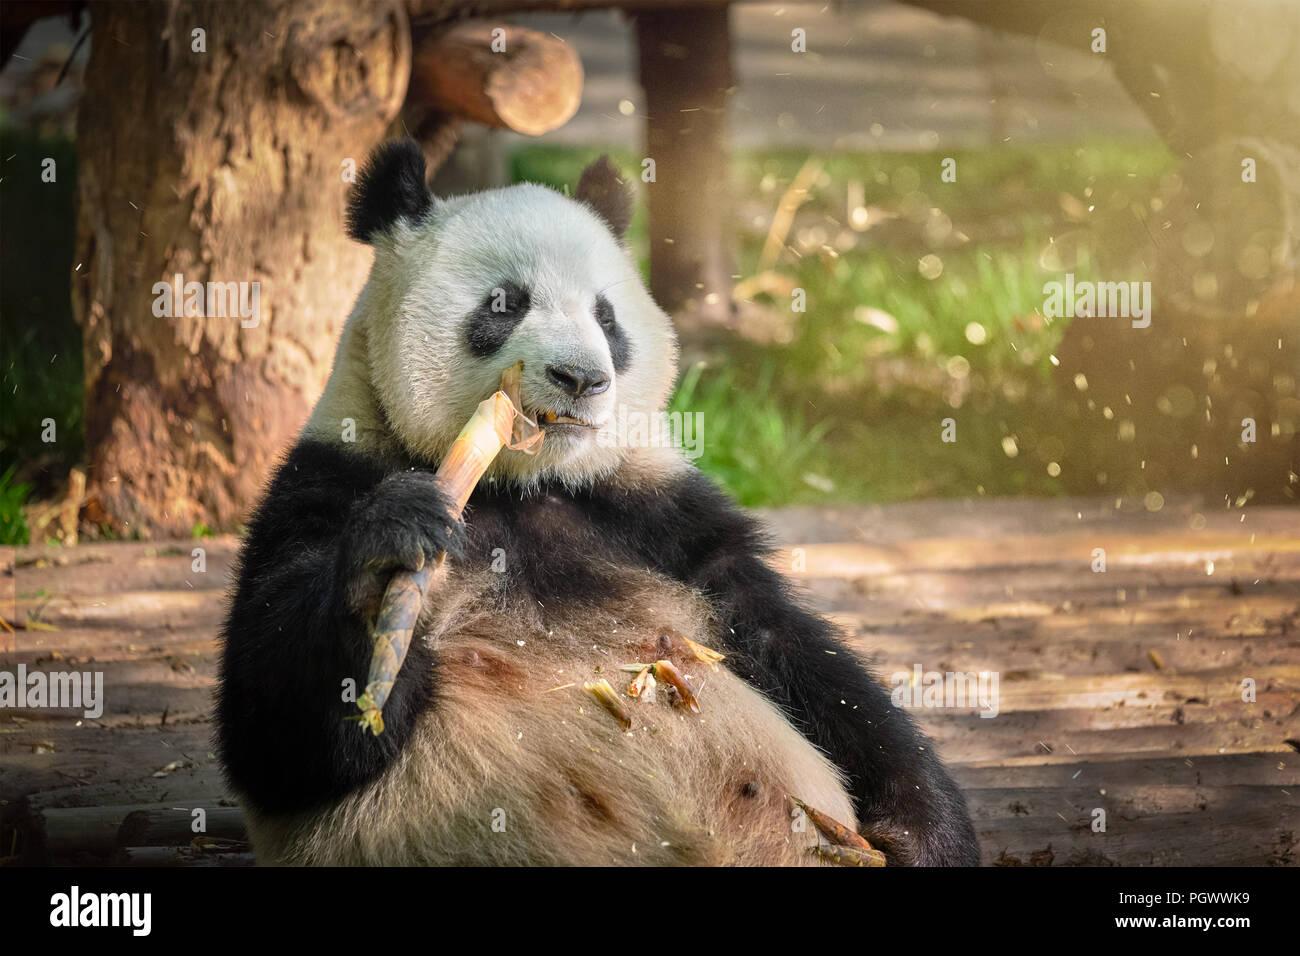 Giant panda bear in China - Stock Image